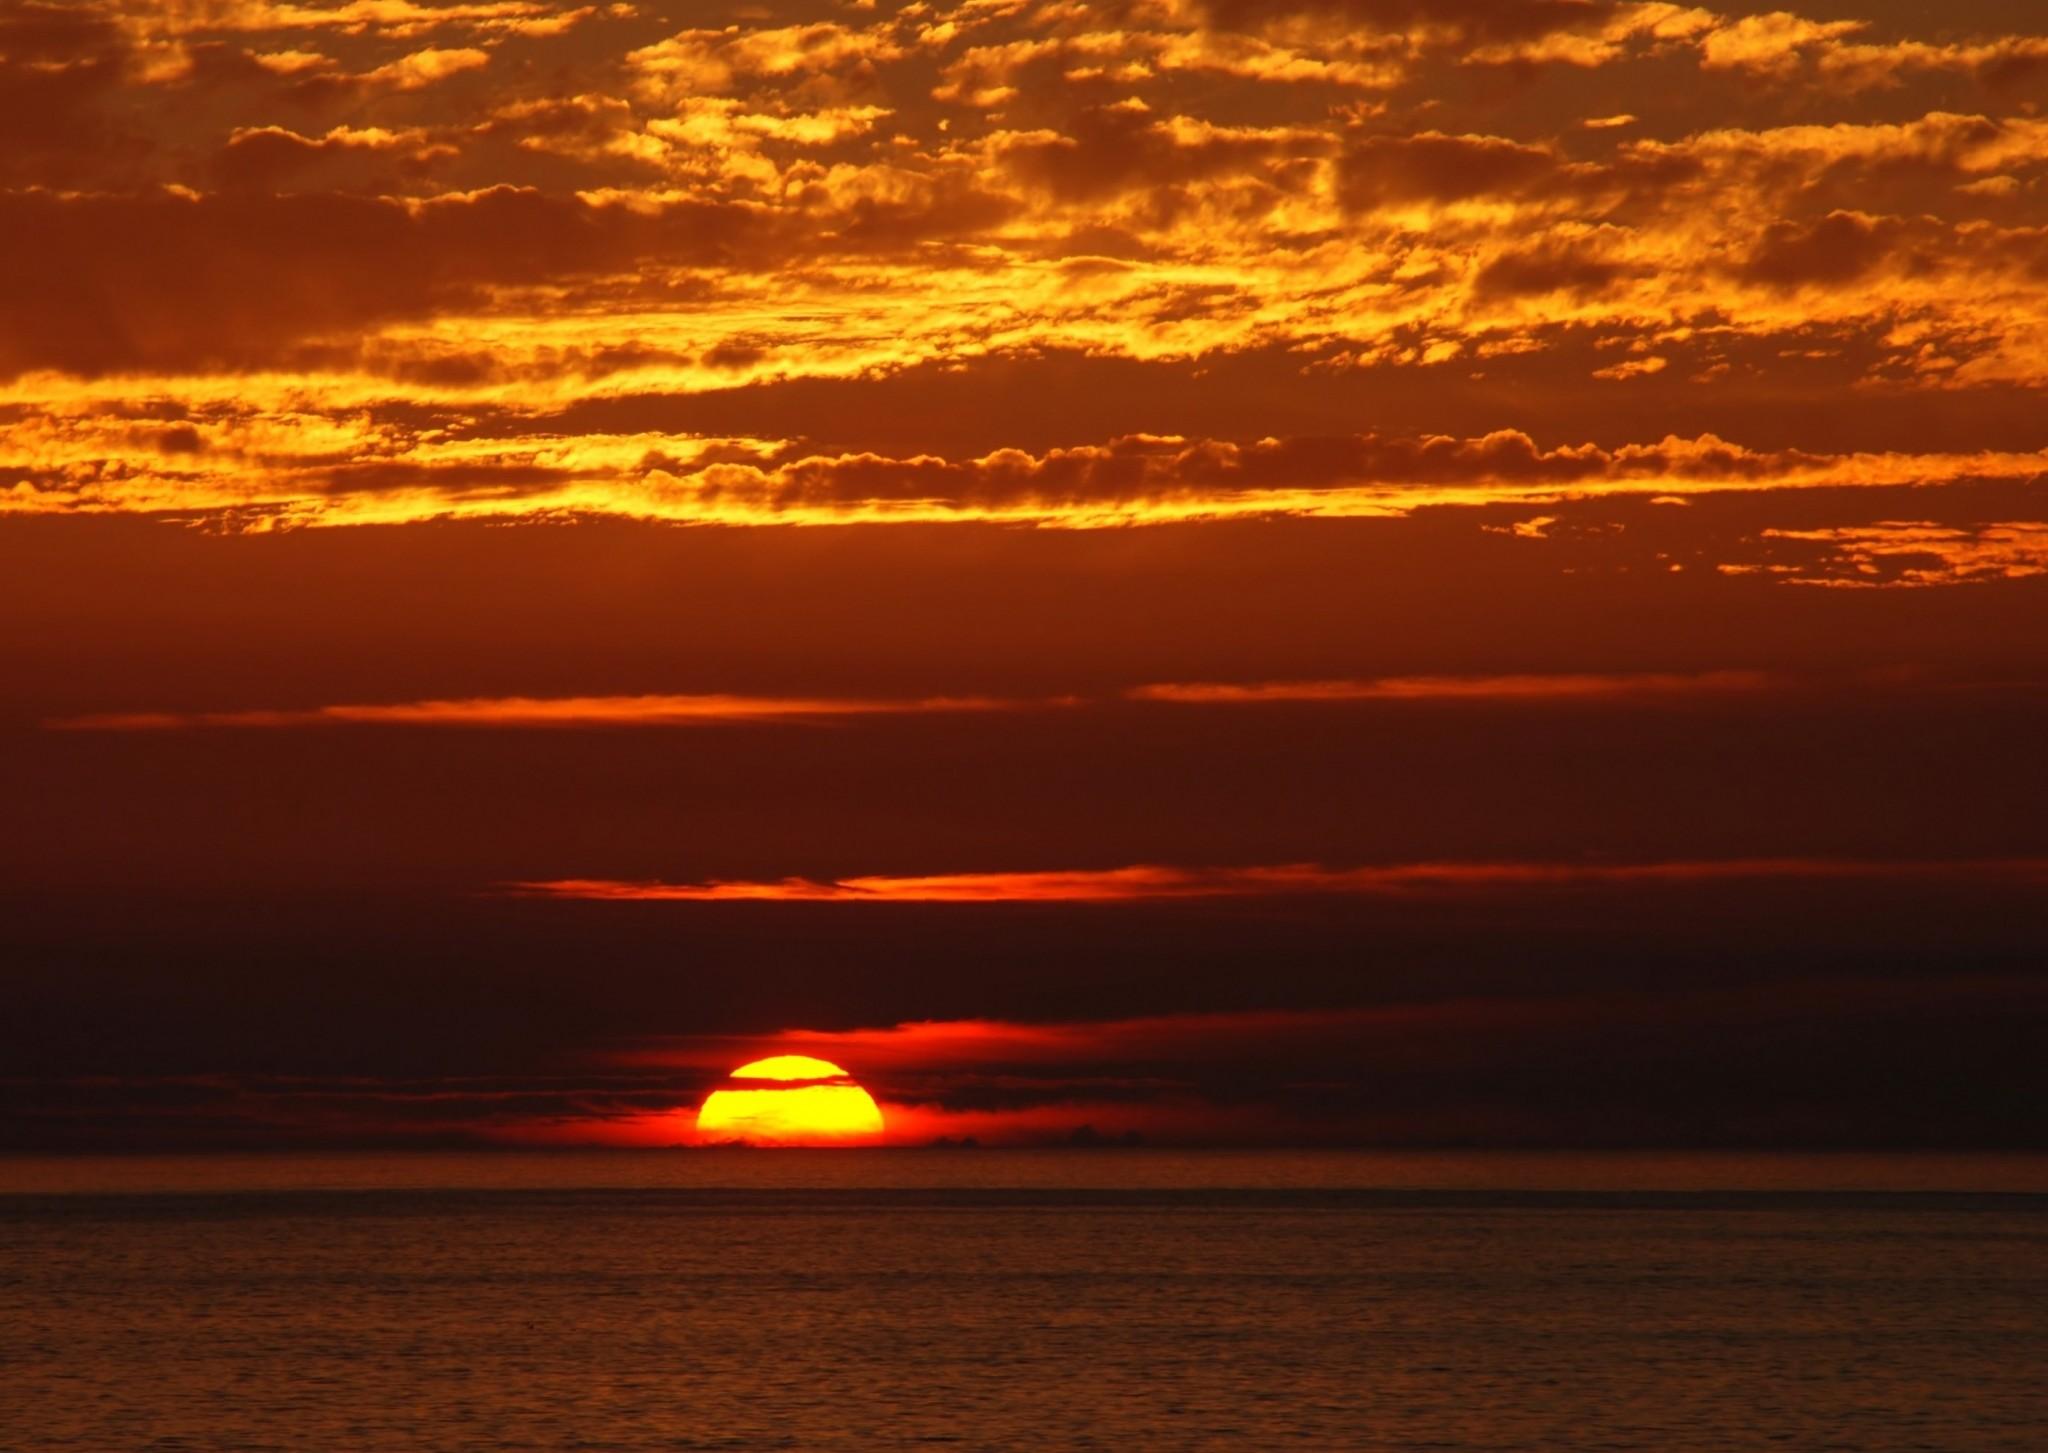 sunset background hd